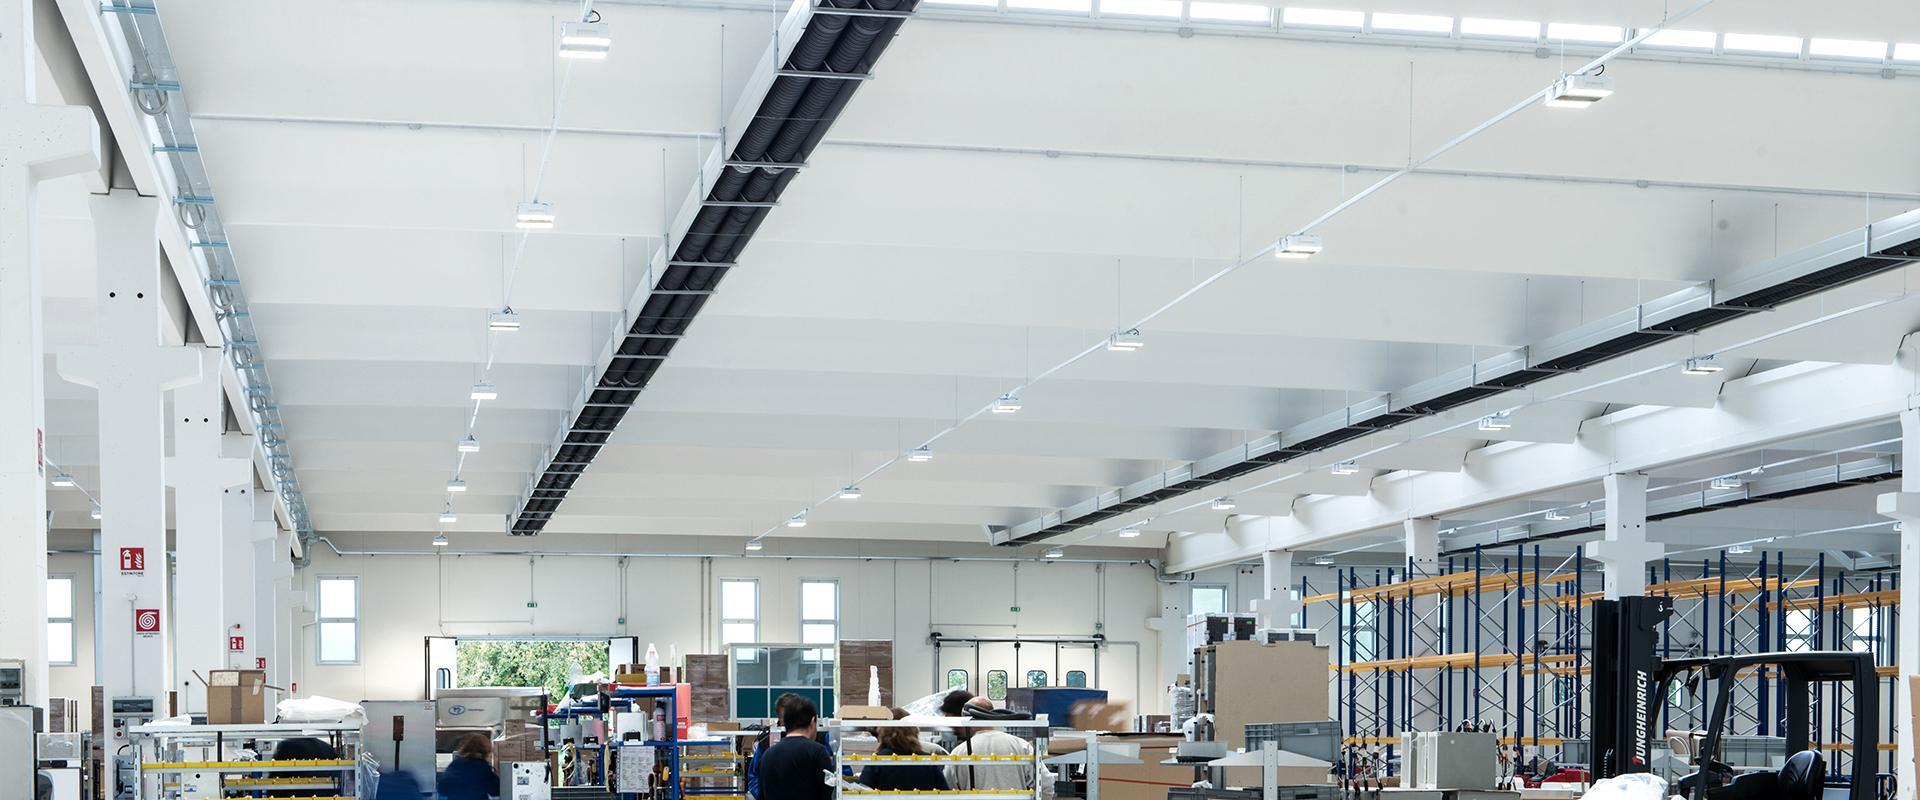 Illuminazione LED aree produttive industriali